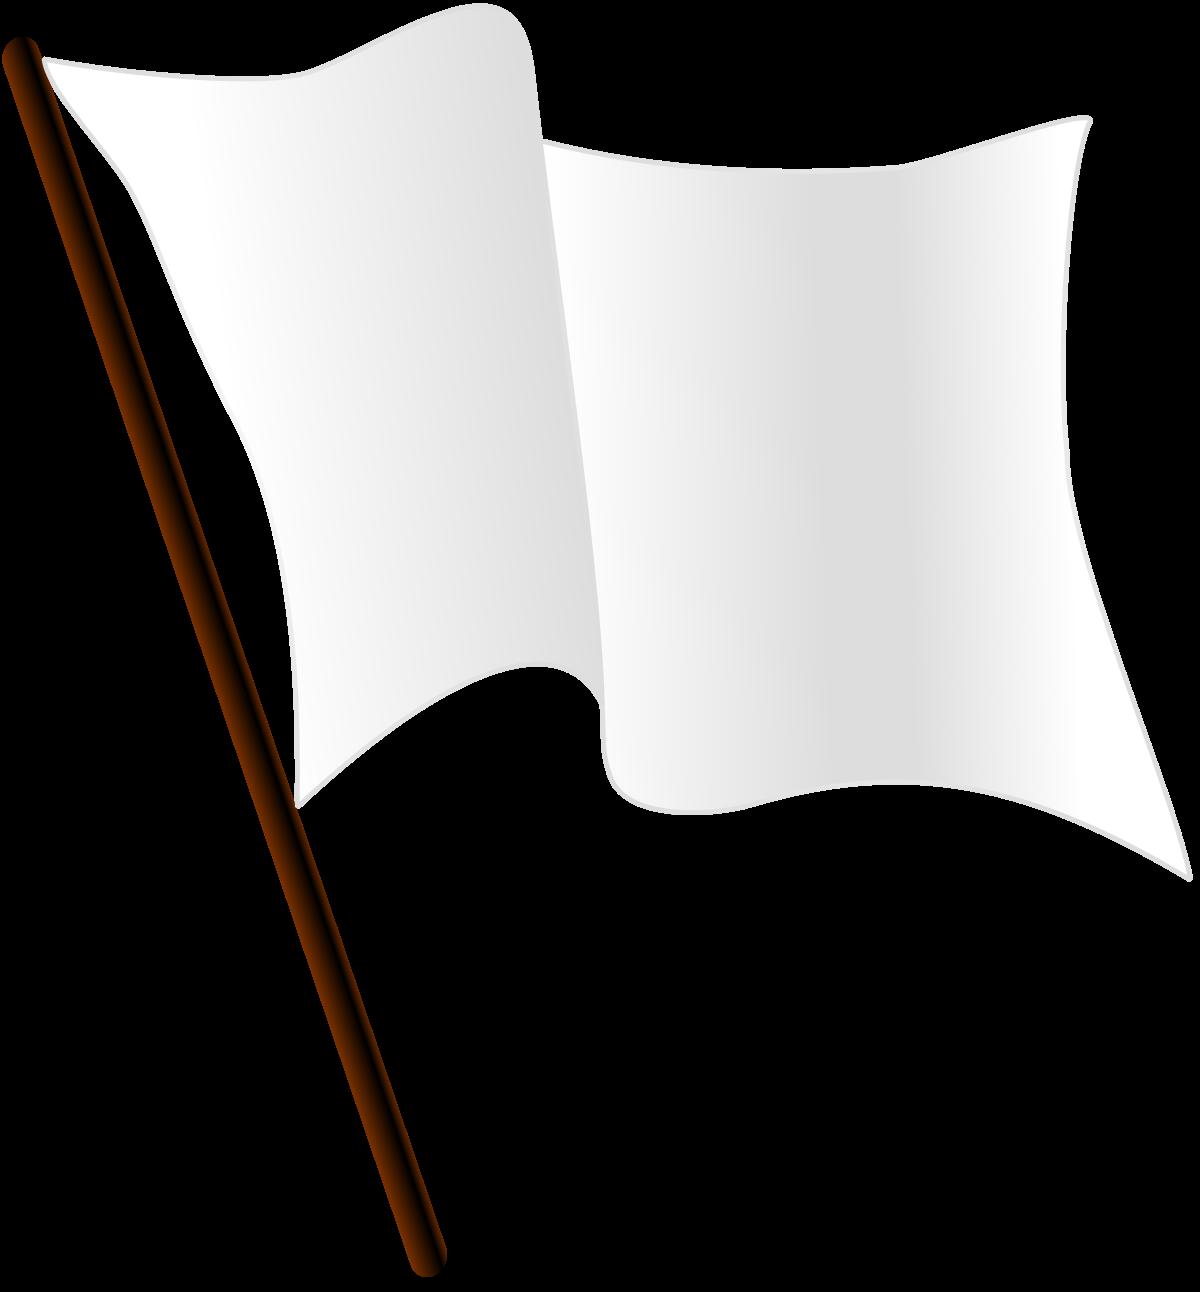 White flag clipart 4 » Clipart Station.